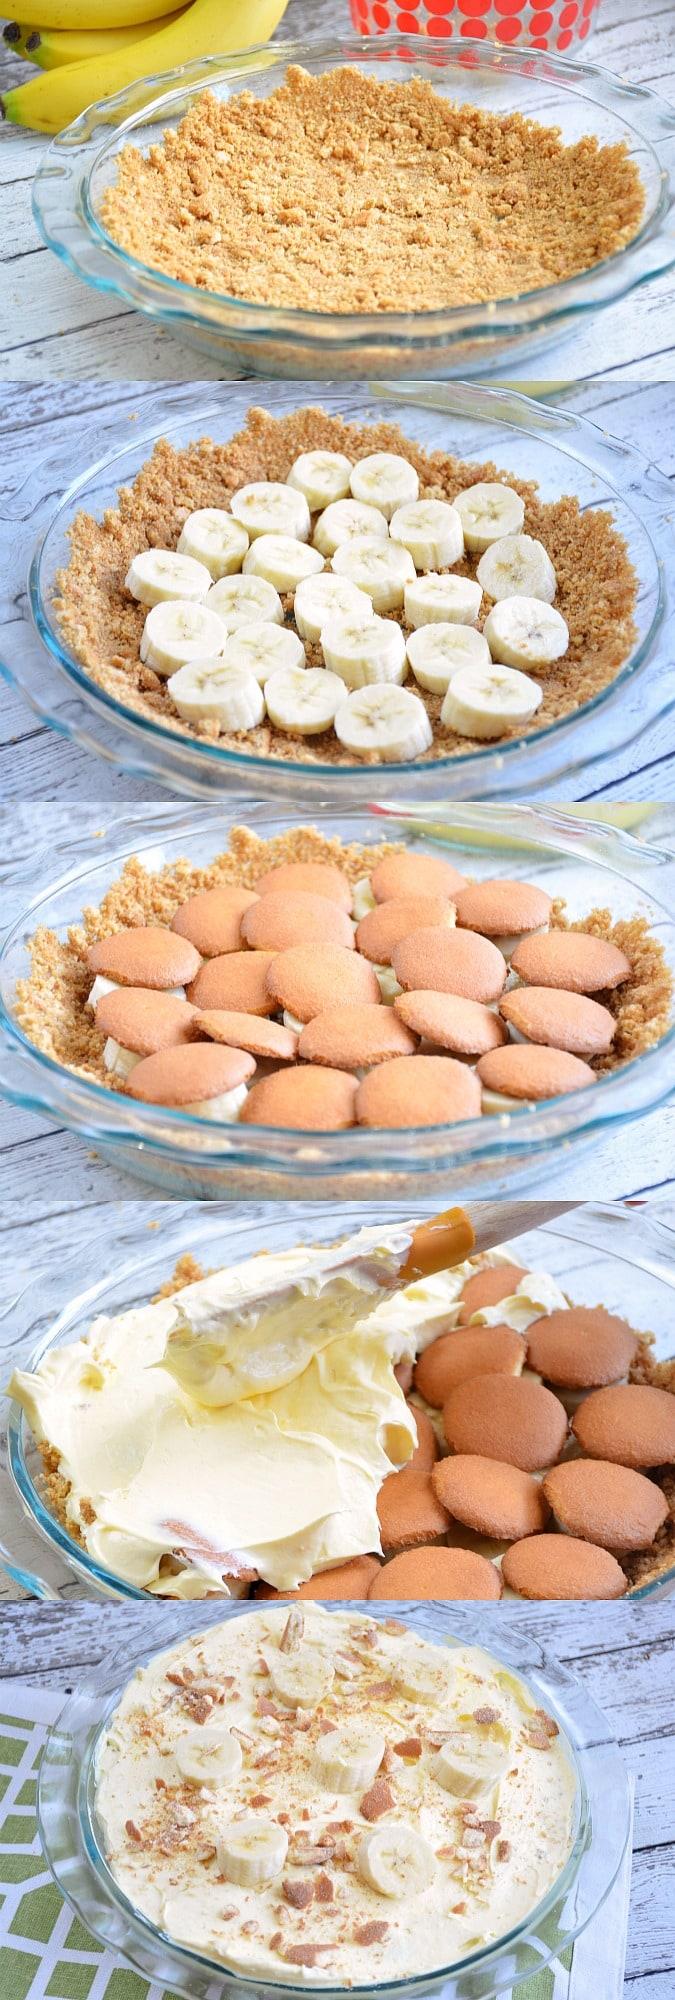 no-bake-banana-cream-pie